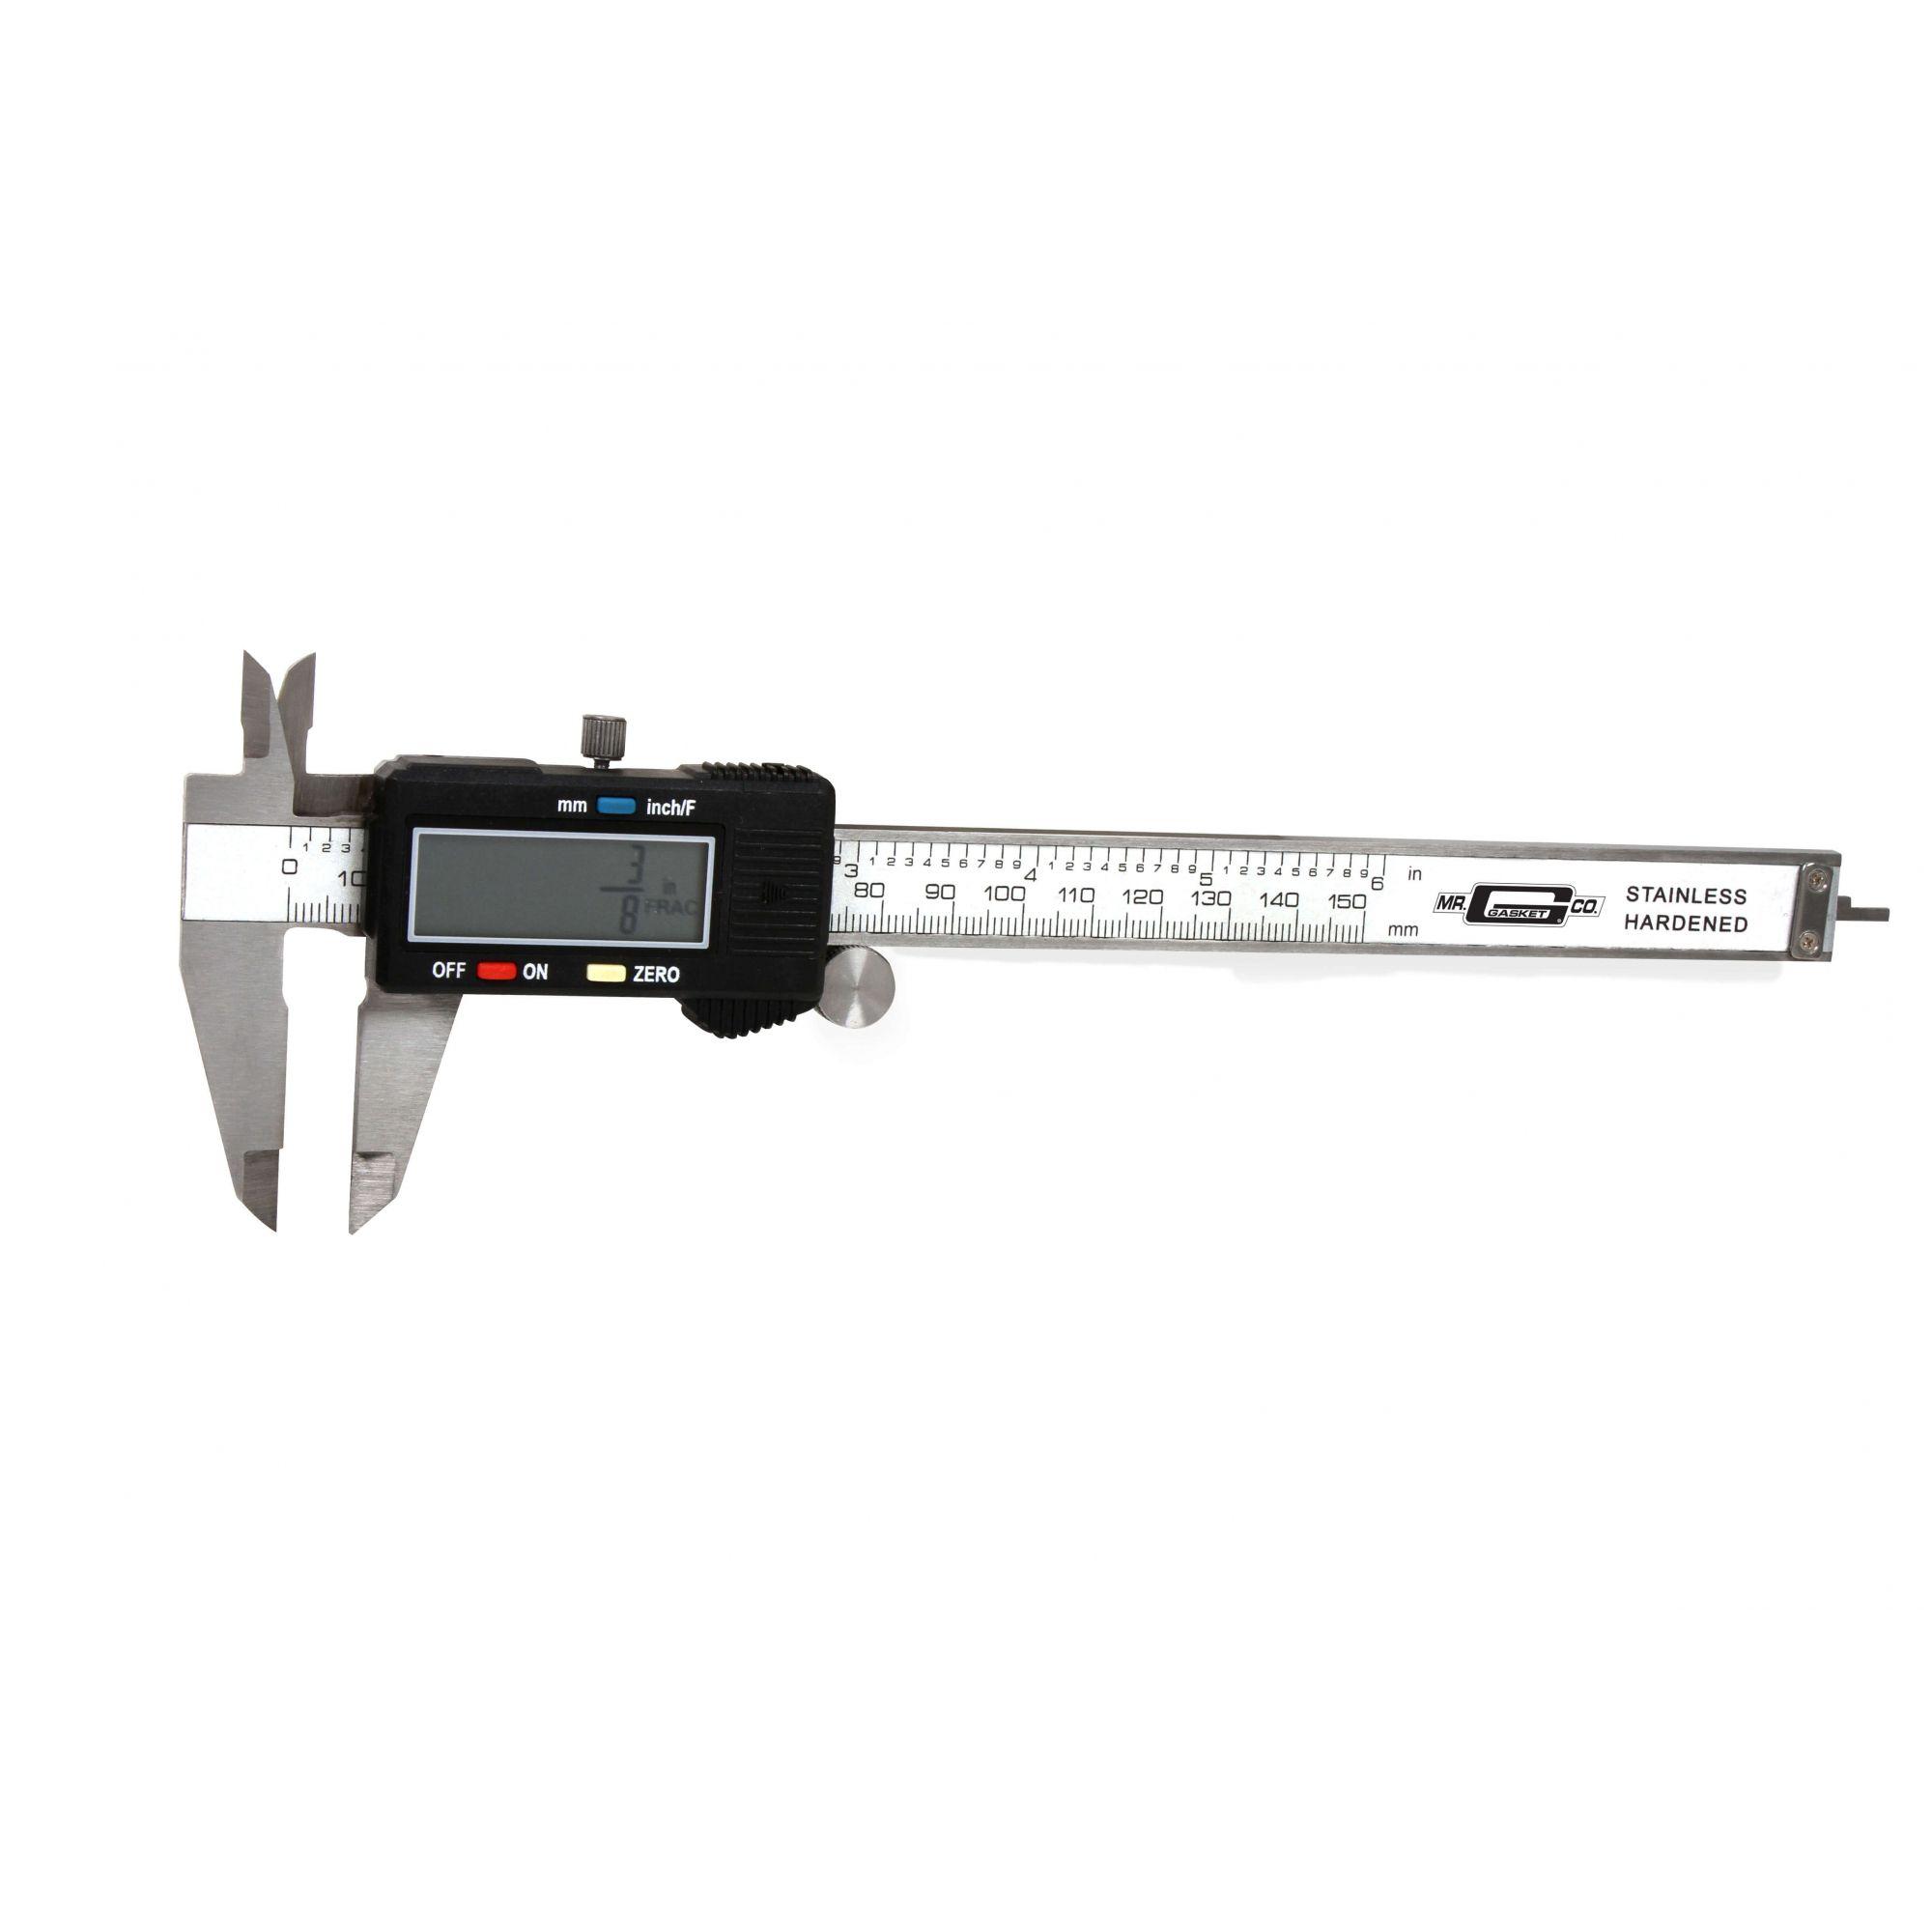 Paquímetro Digital 6 Polegadas - Mr. Gasket  - PRO-1 Serious Performance